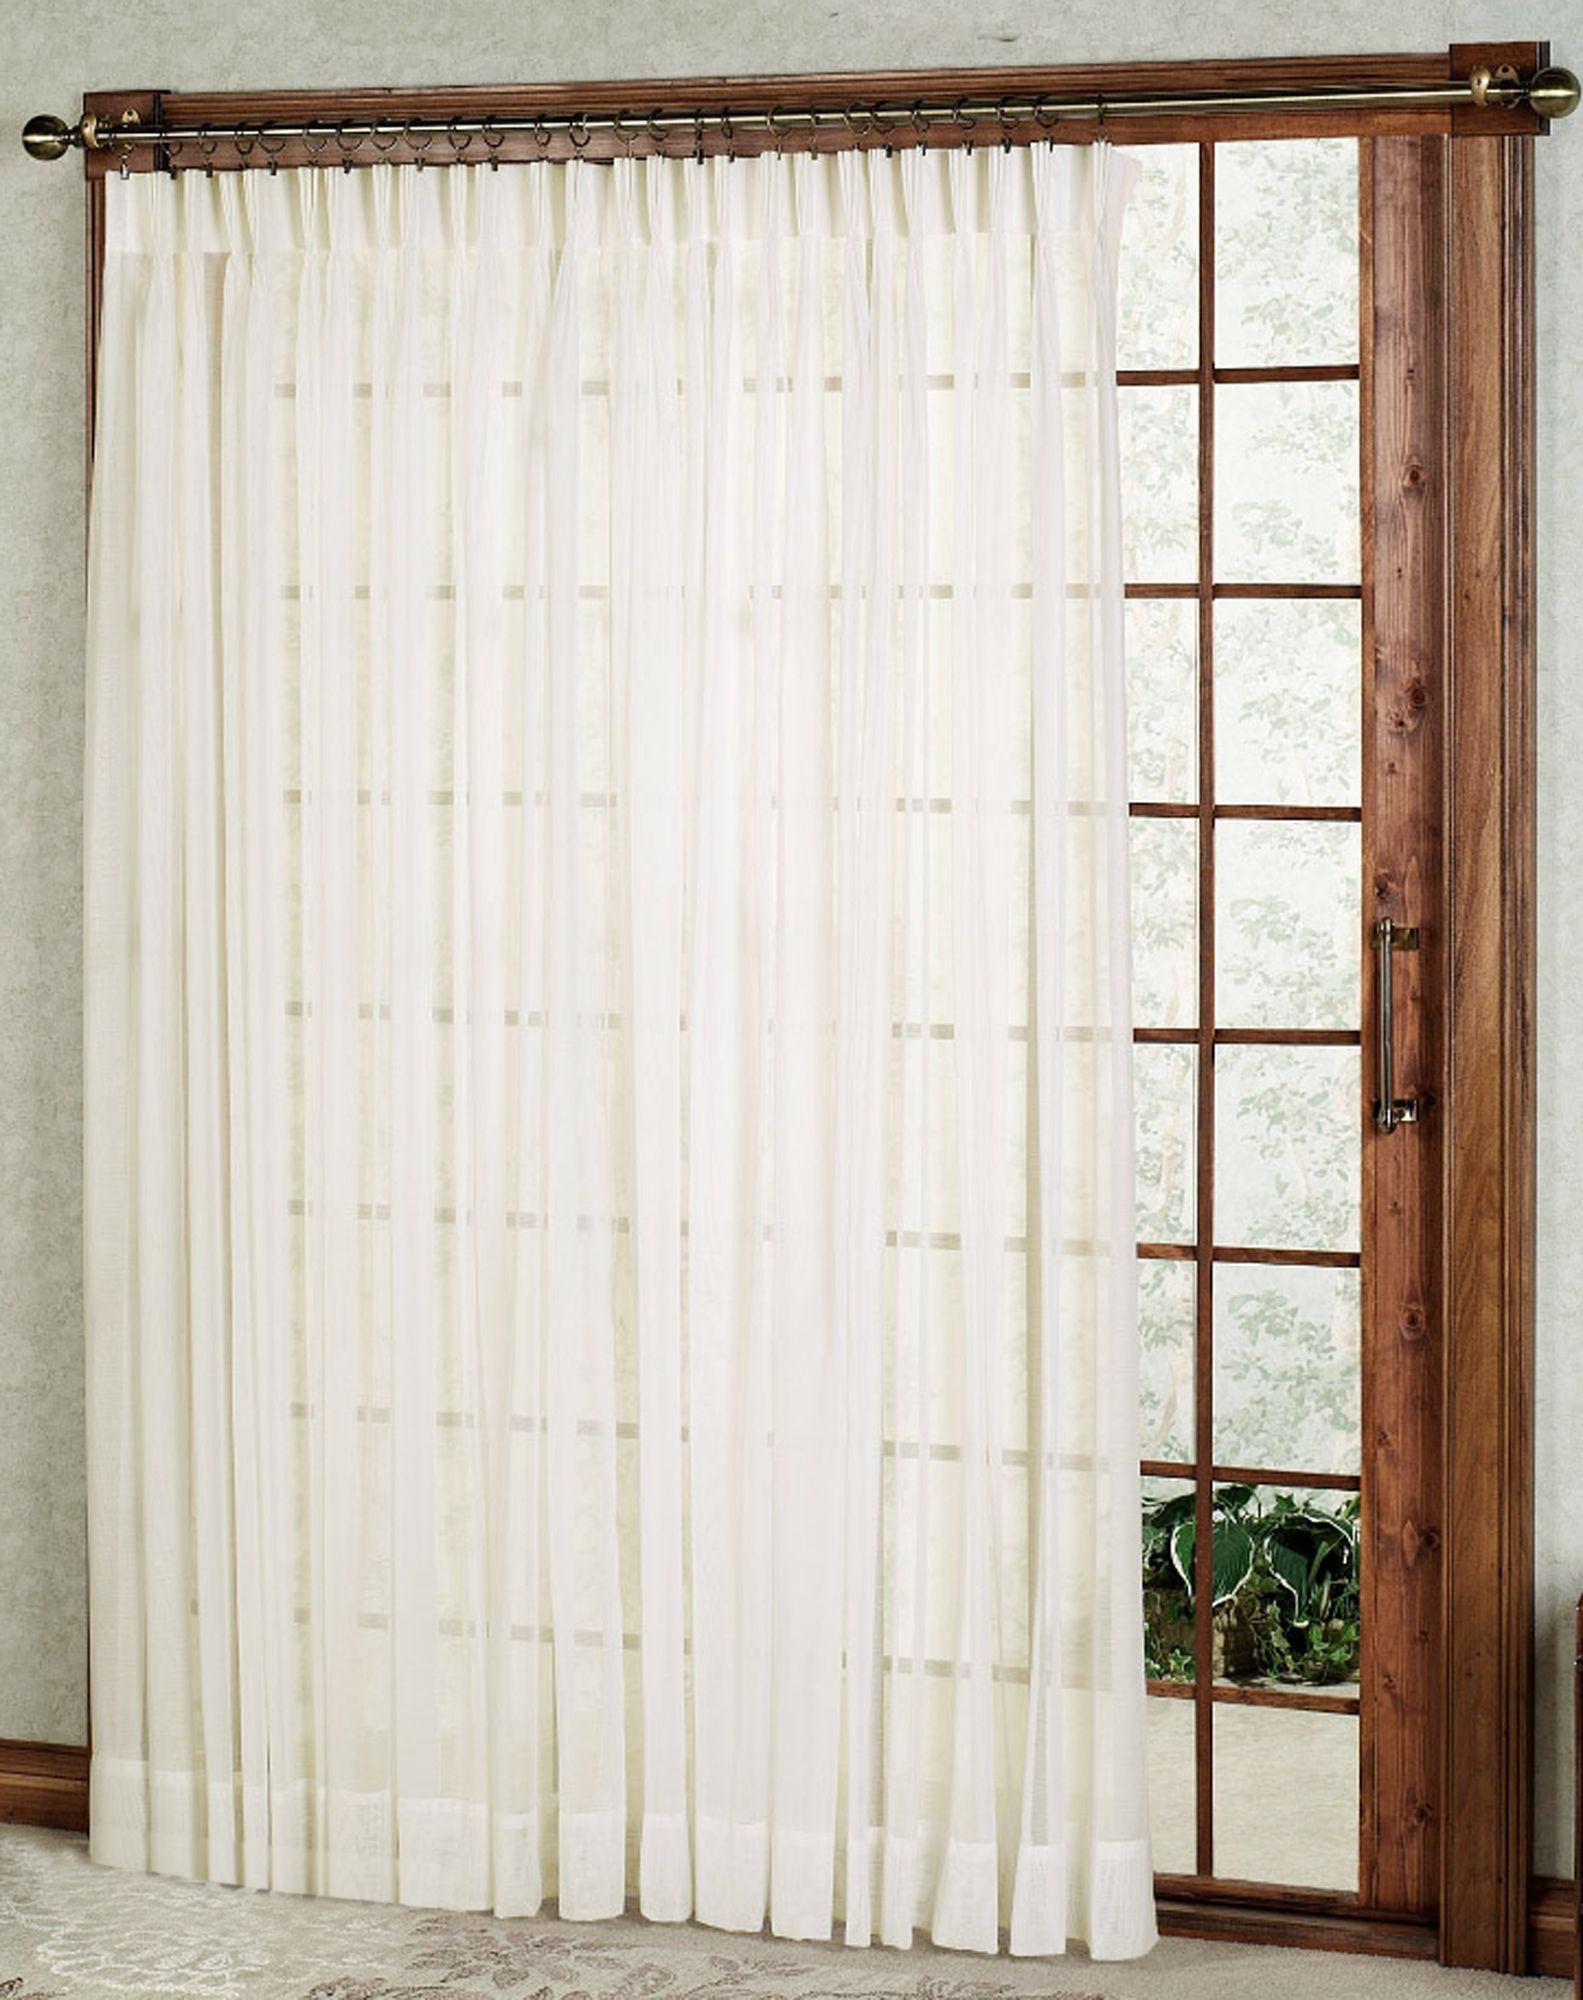 Splendor Batiste Pinch Pleat Patio Curtain Panel Panel Curtains Patio Curtains Curtains